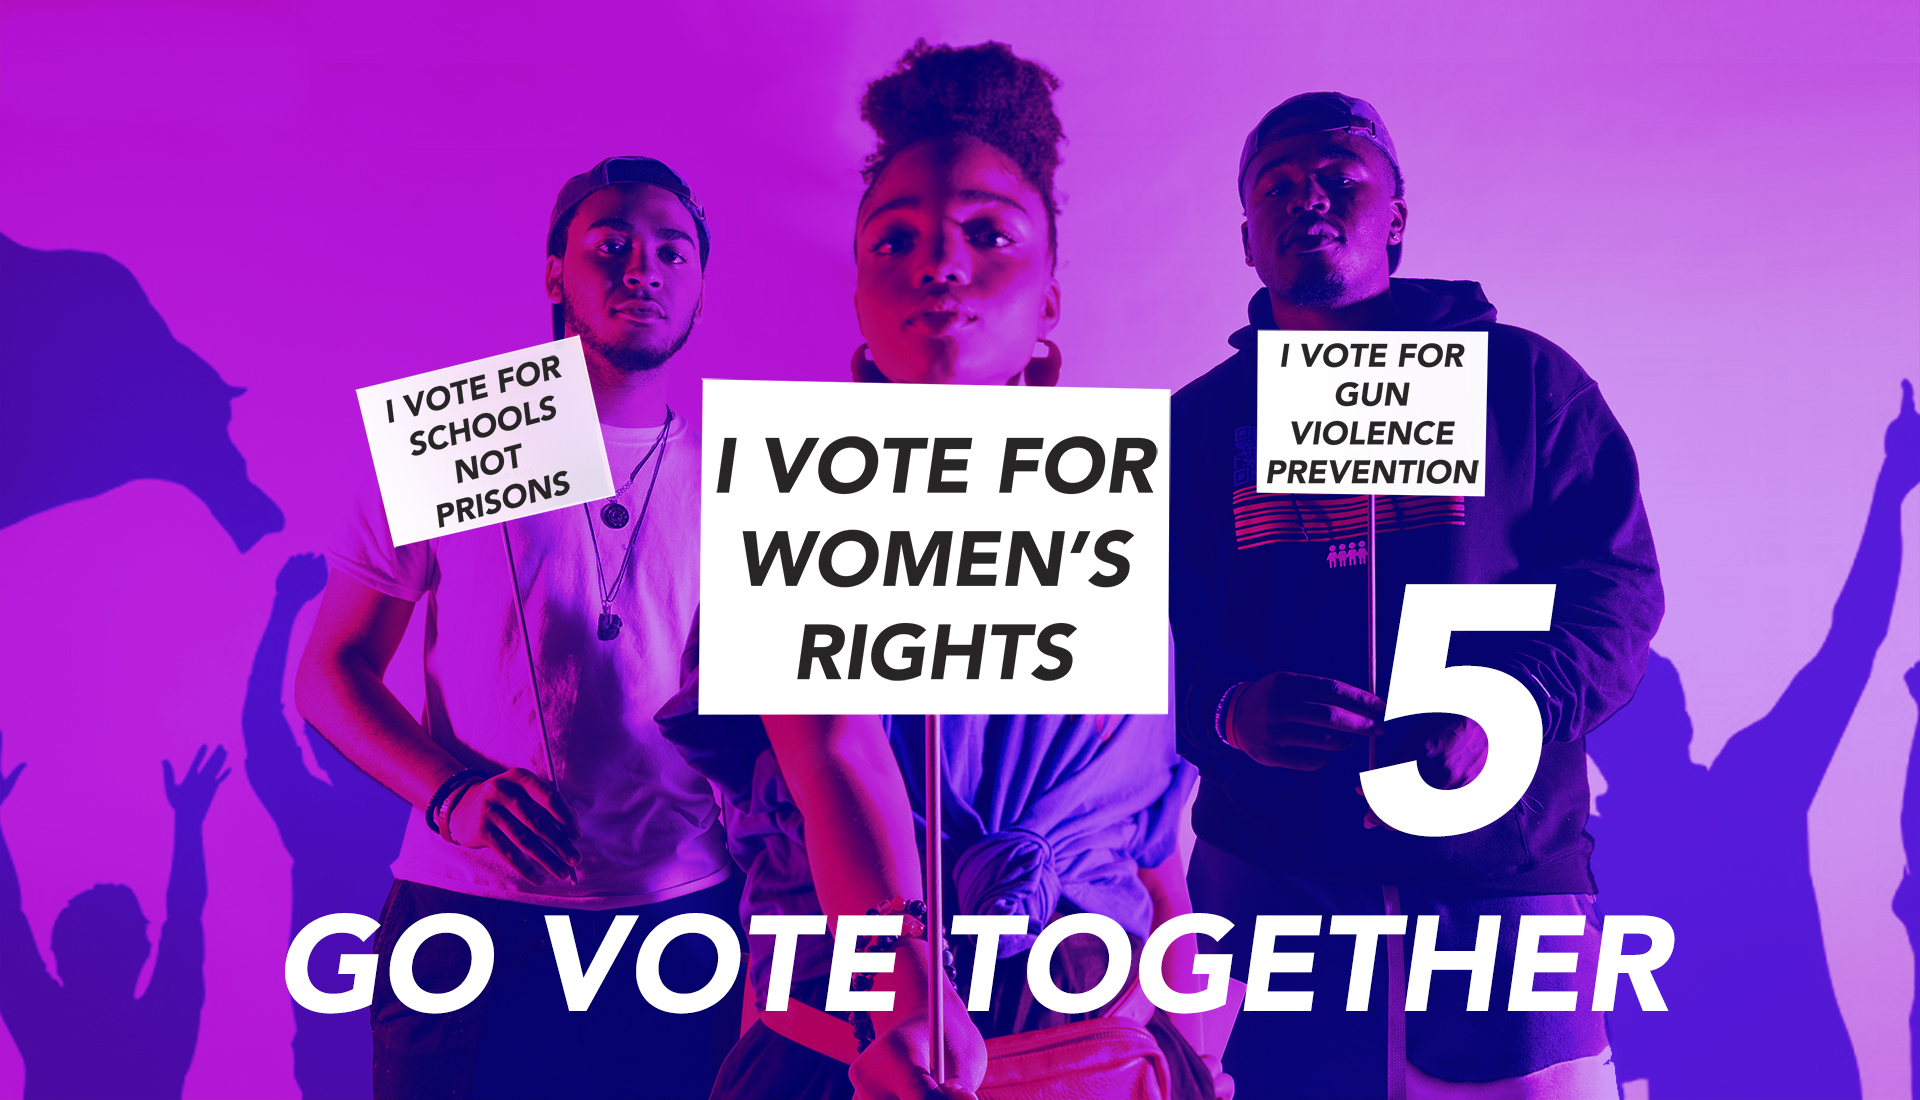 Go Vote Together